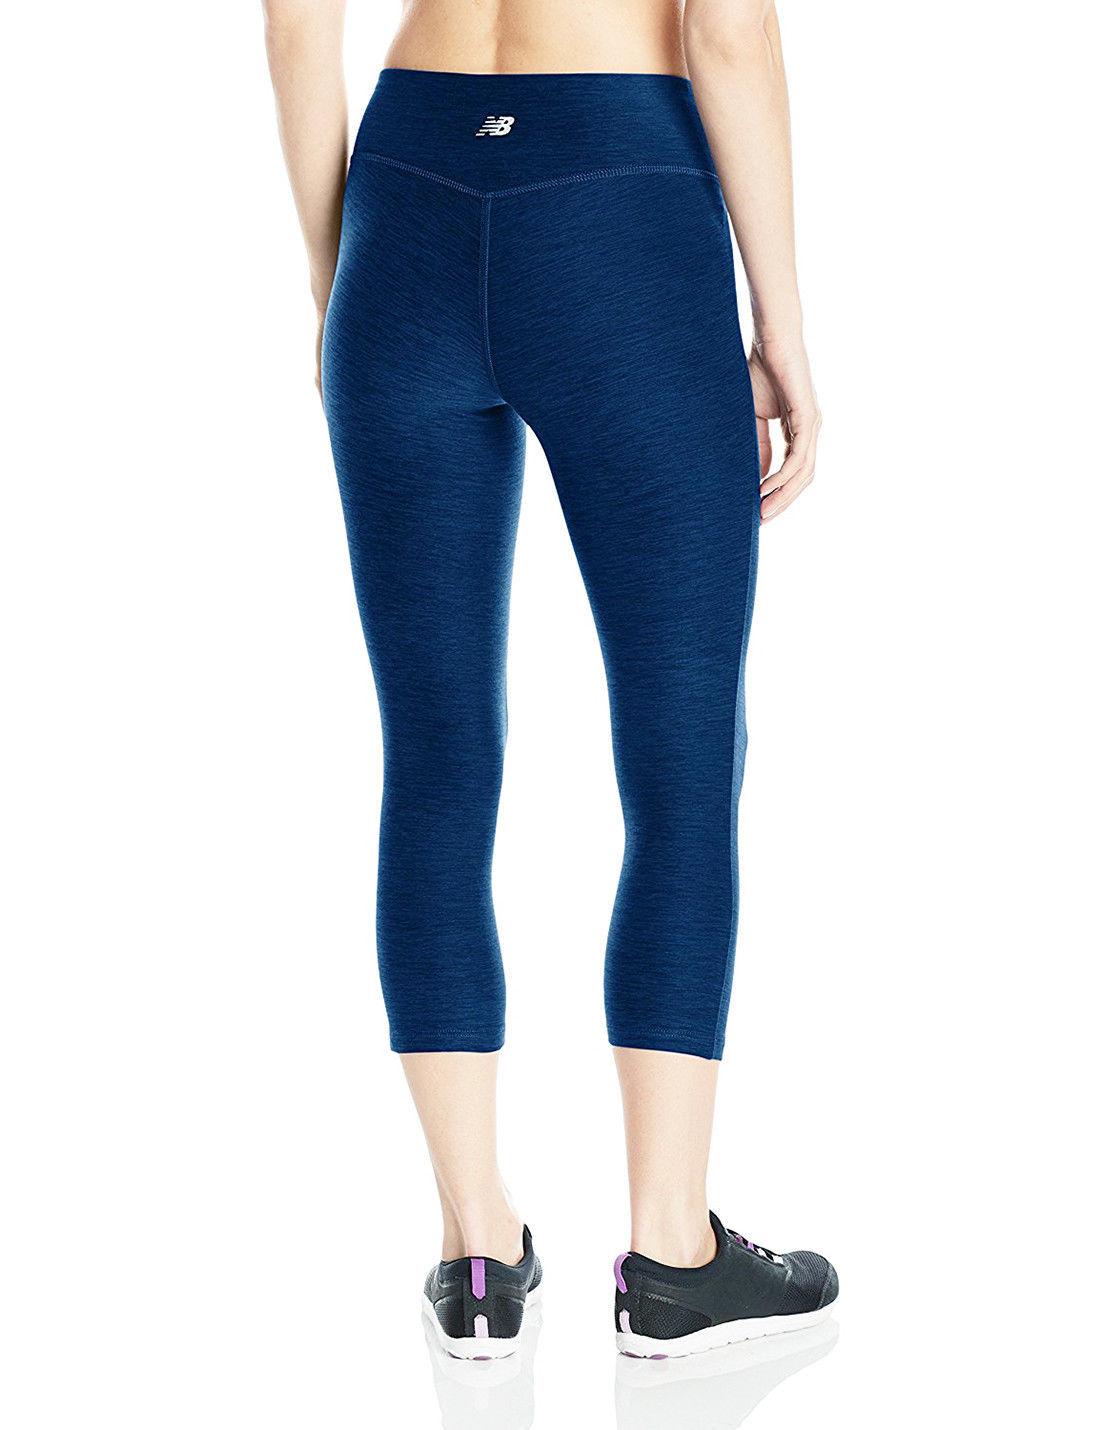 New Balance Women's Space Dye Leggings WP61813